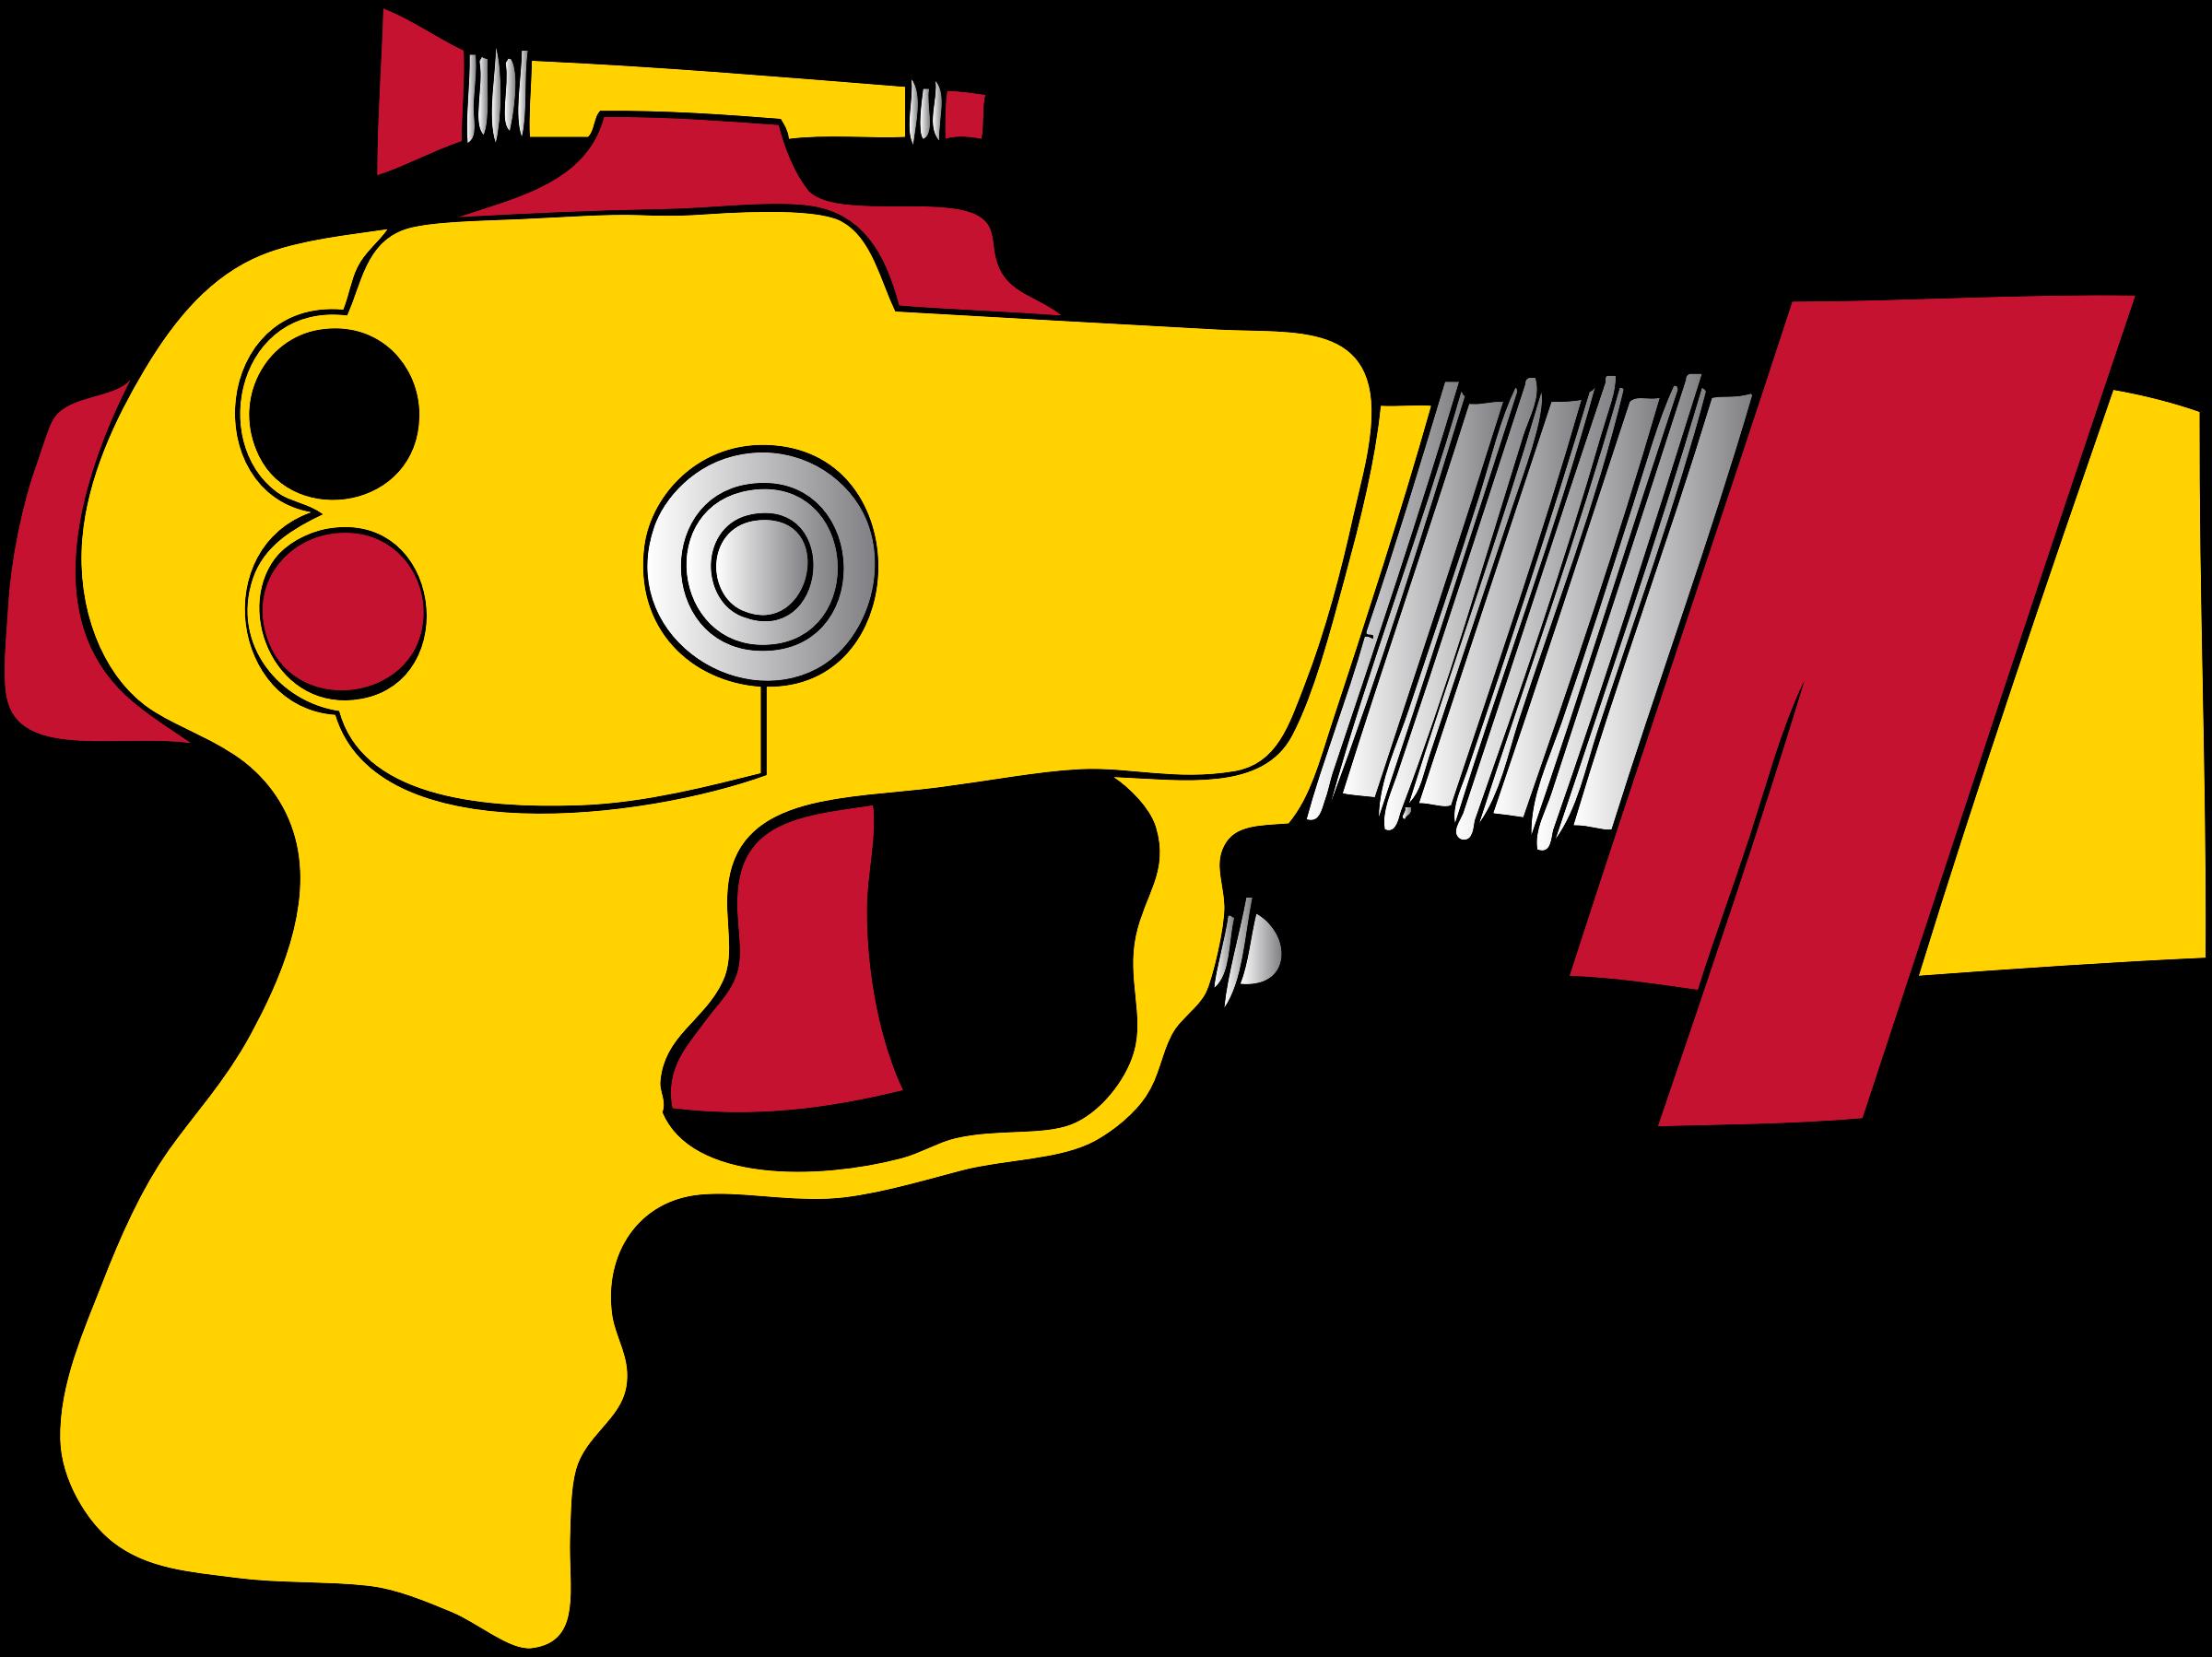 Clipart Ray Gun Clip art of Open Clipart #1806 — Clipartwork.